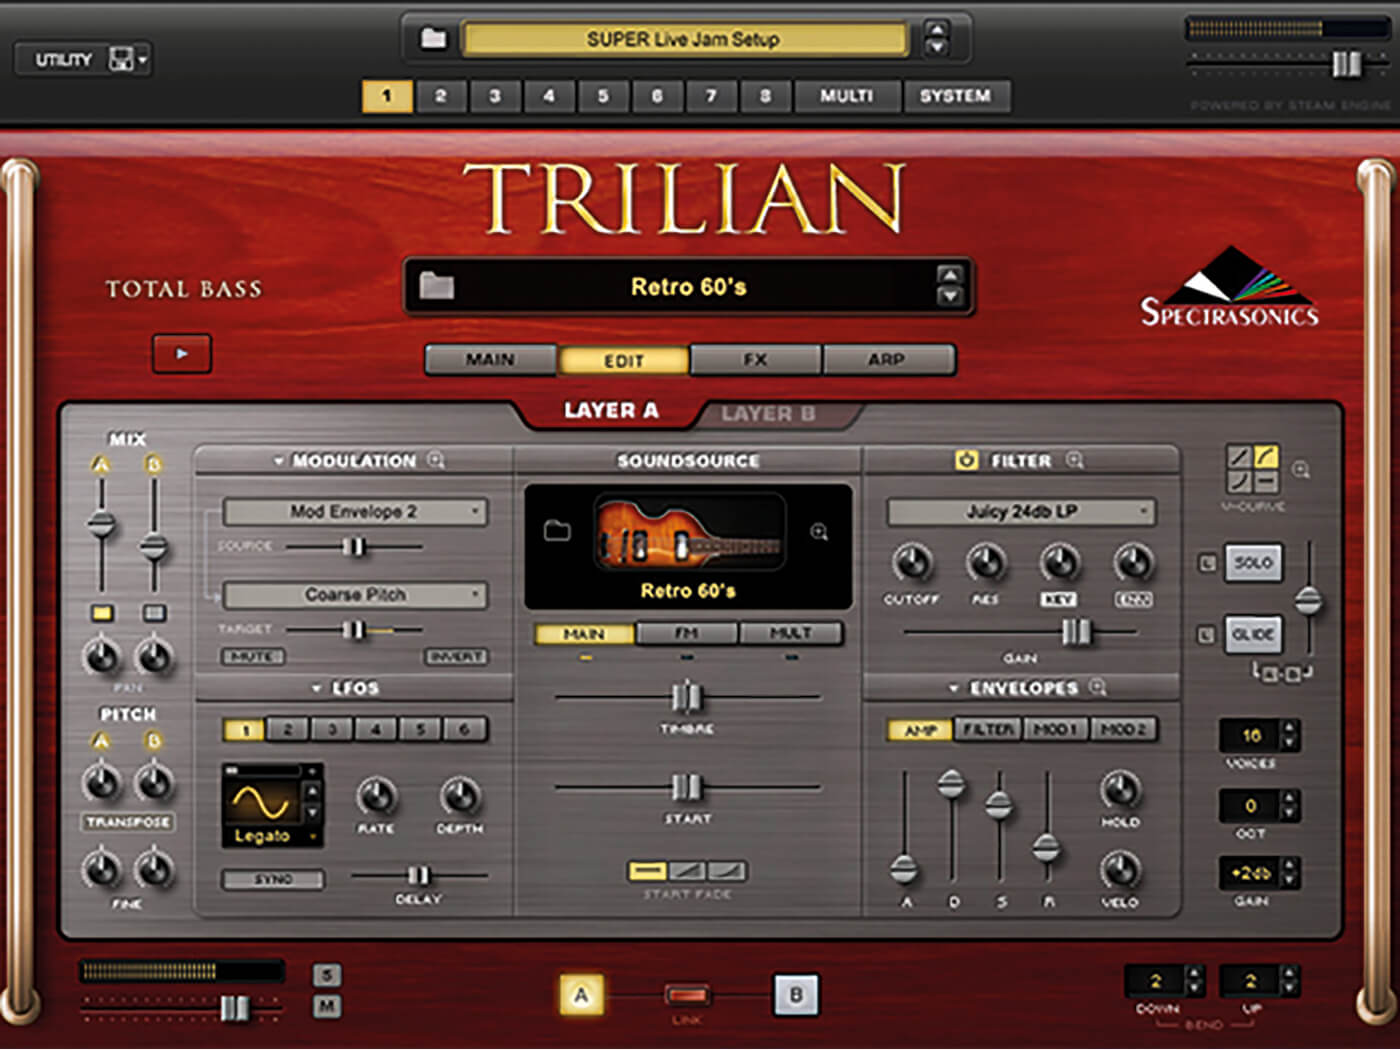 Spetrasonics Trilian